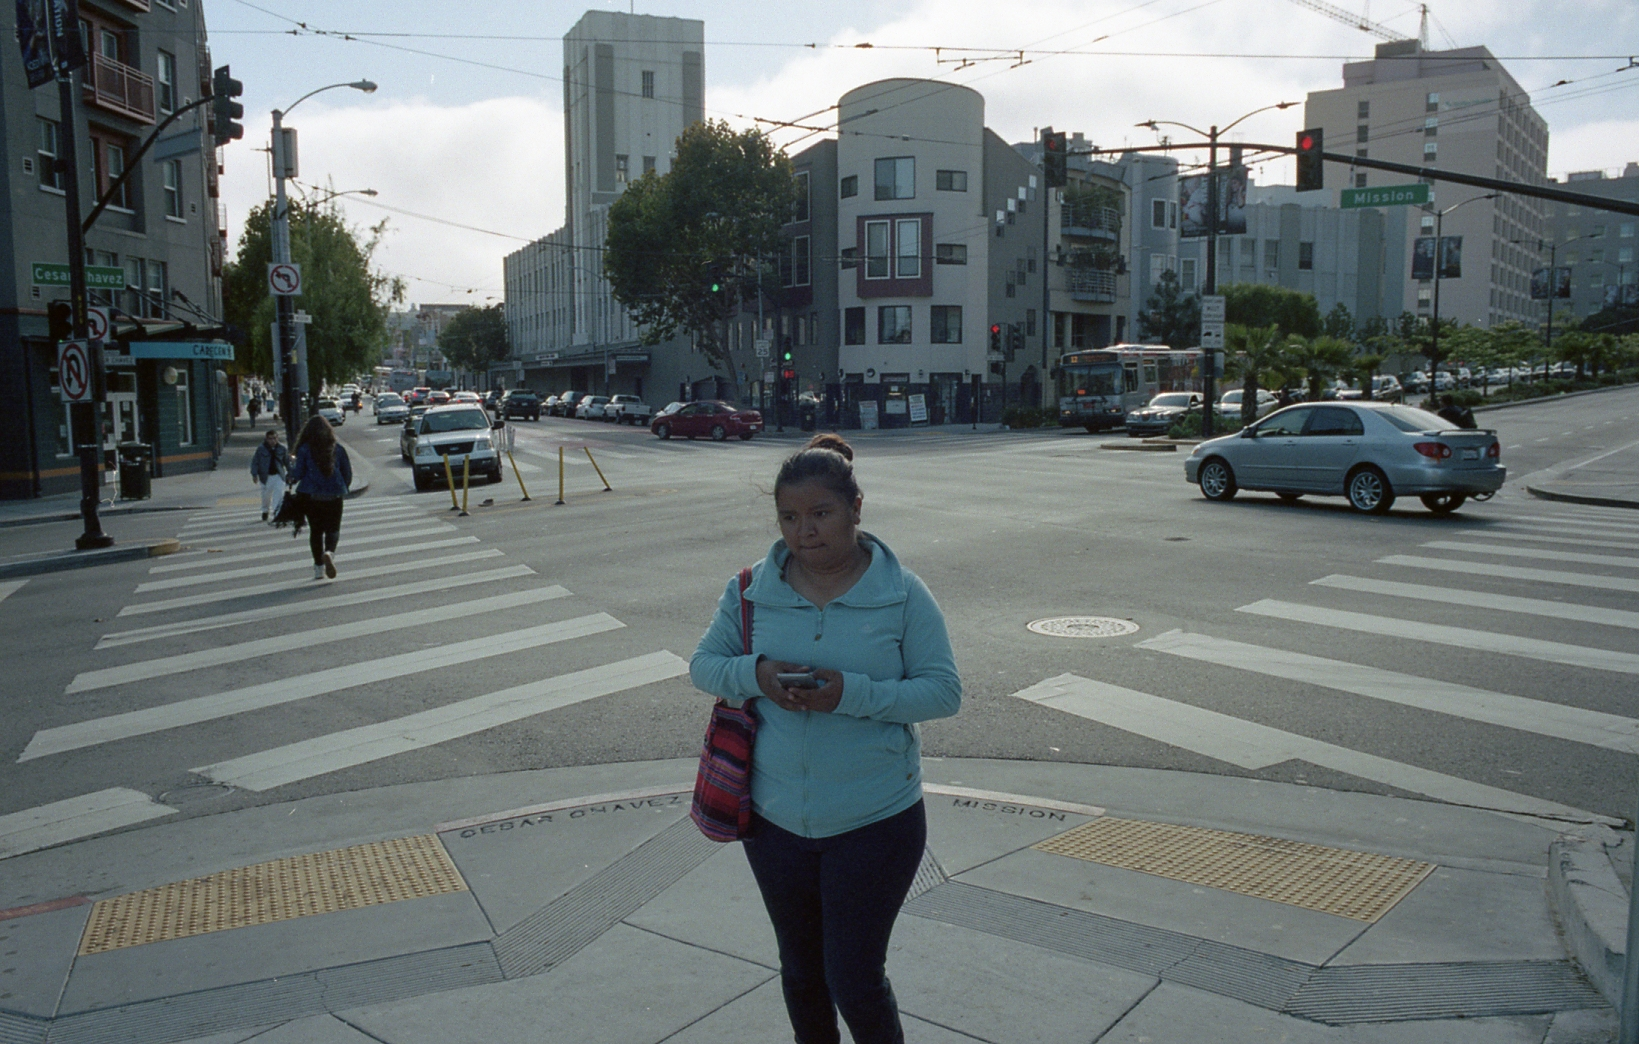 sf street259.jpg